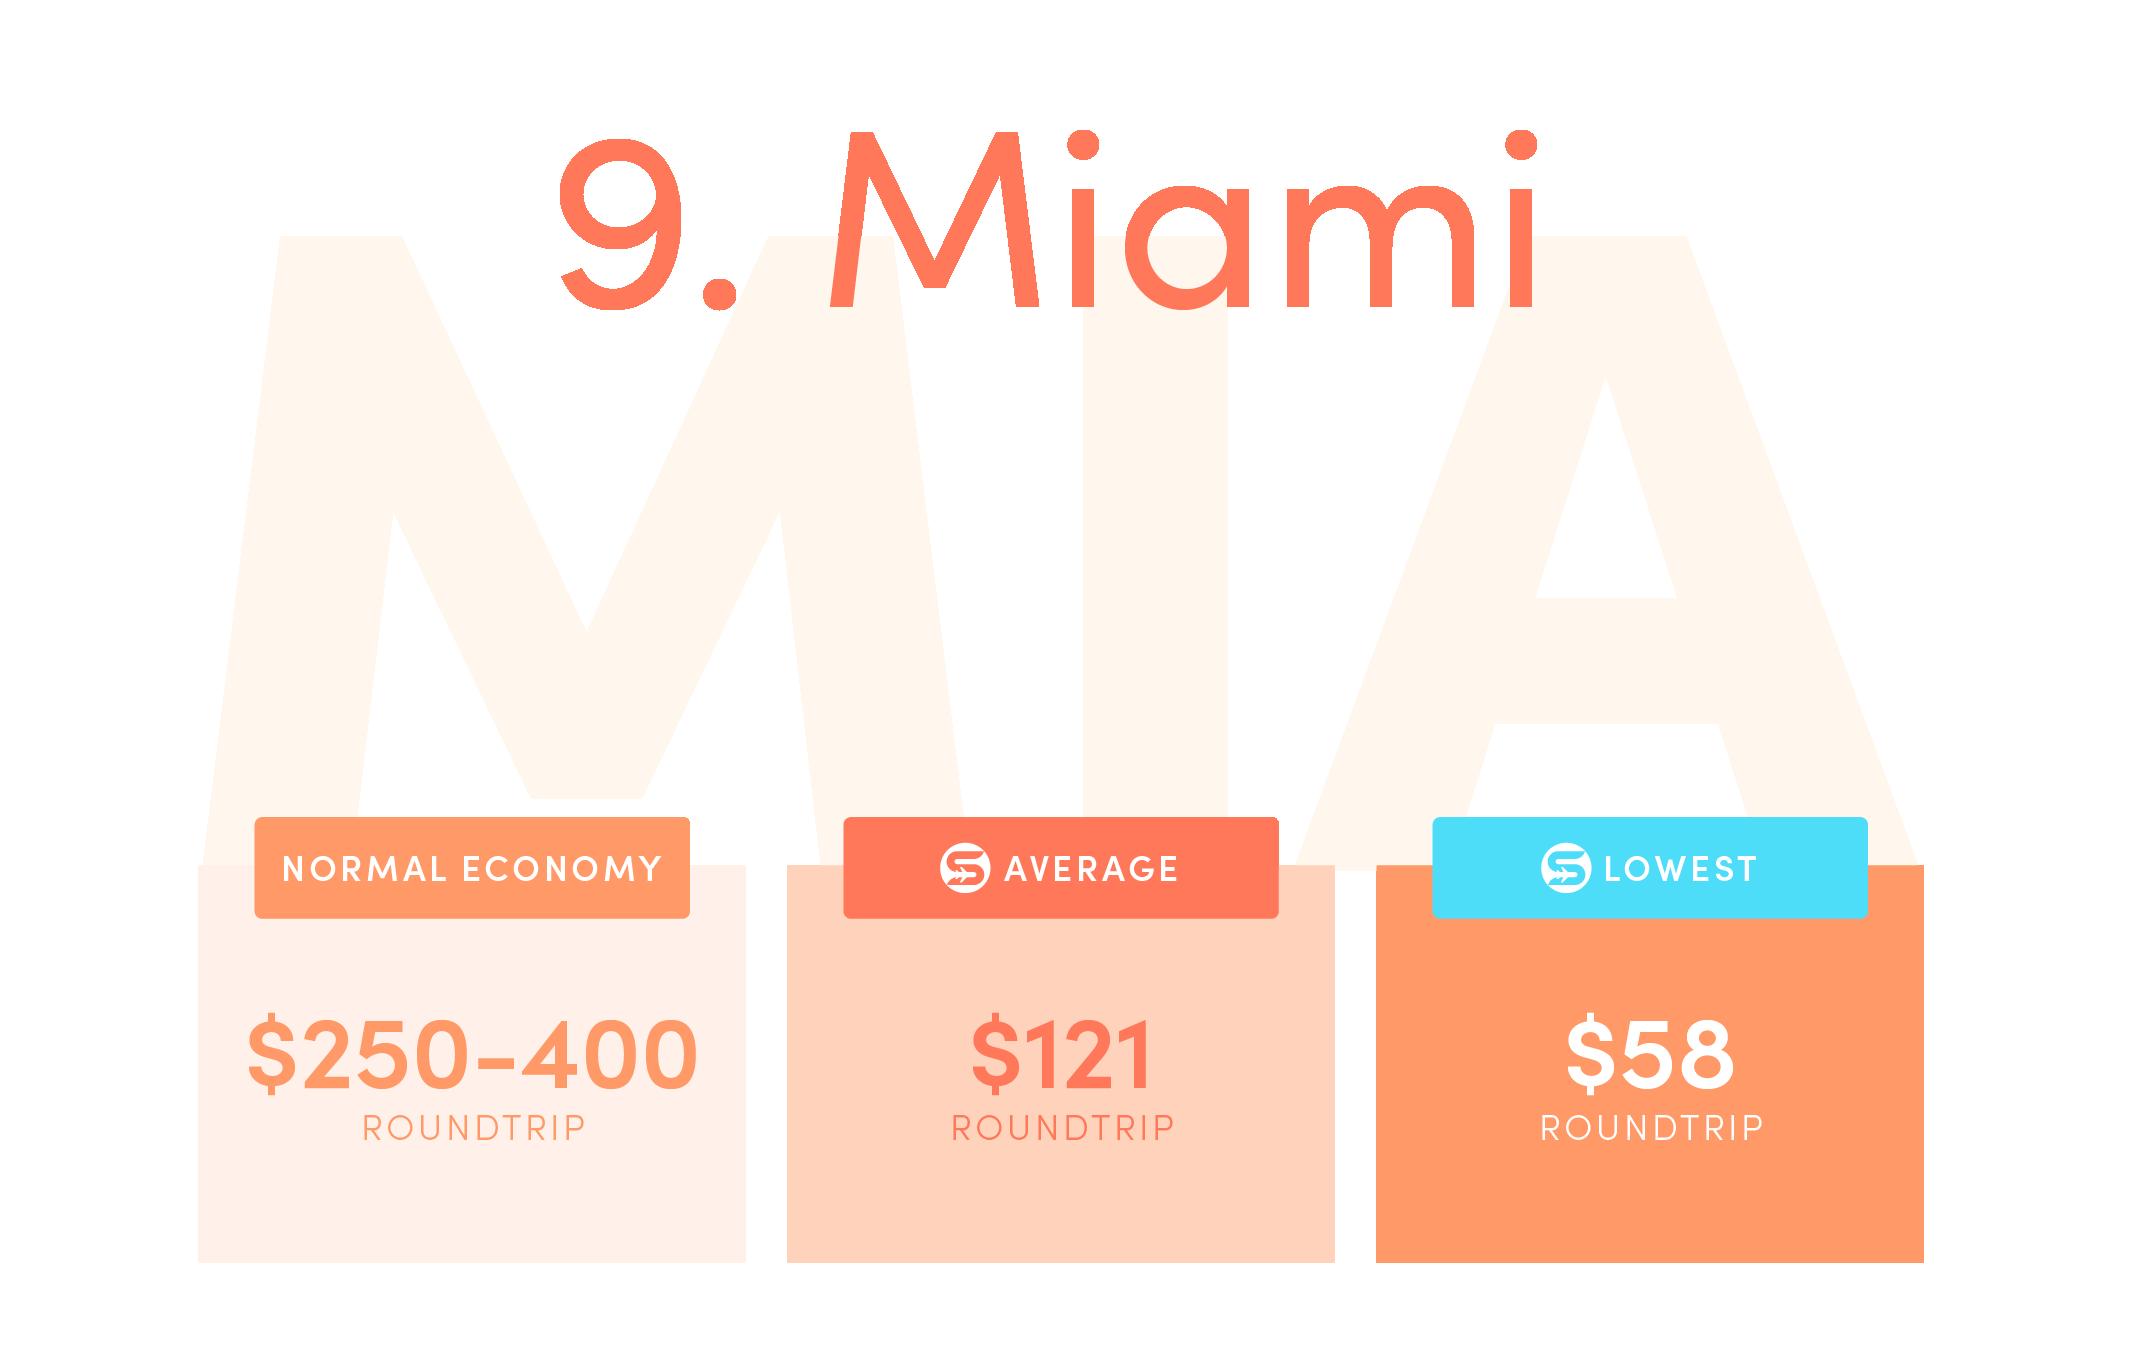 Miami (MIA)Normal economy price from the US: $250-$400 roundtrip.Average Scott's Cheap Flights economy price: $121 roundtrip.Lowest Scott's Cheap Flights price in 2021: $58 roundtrip.